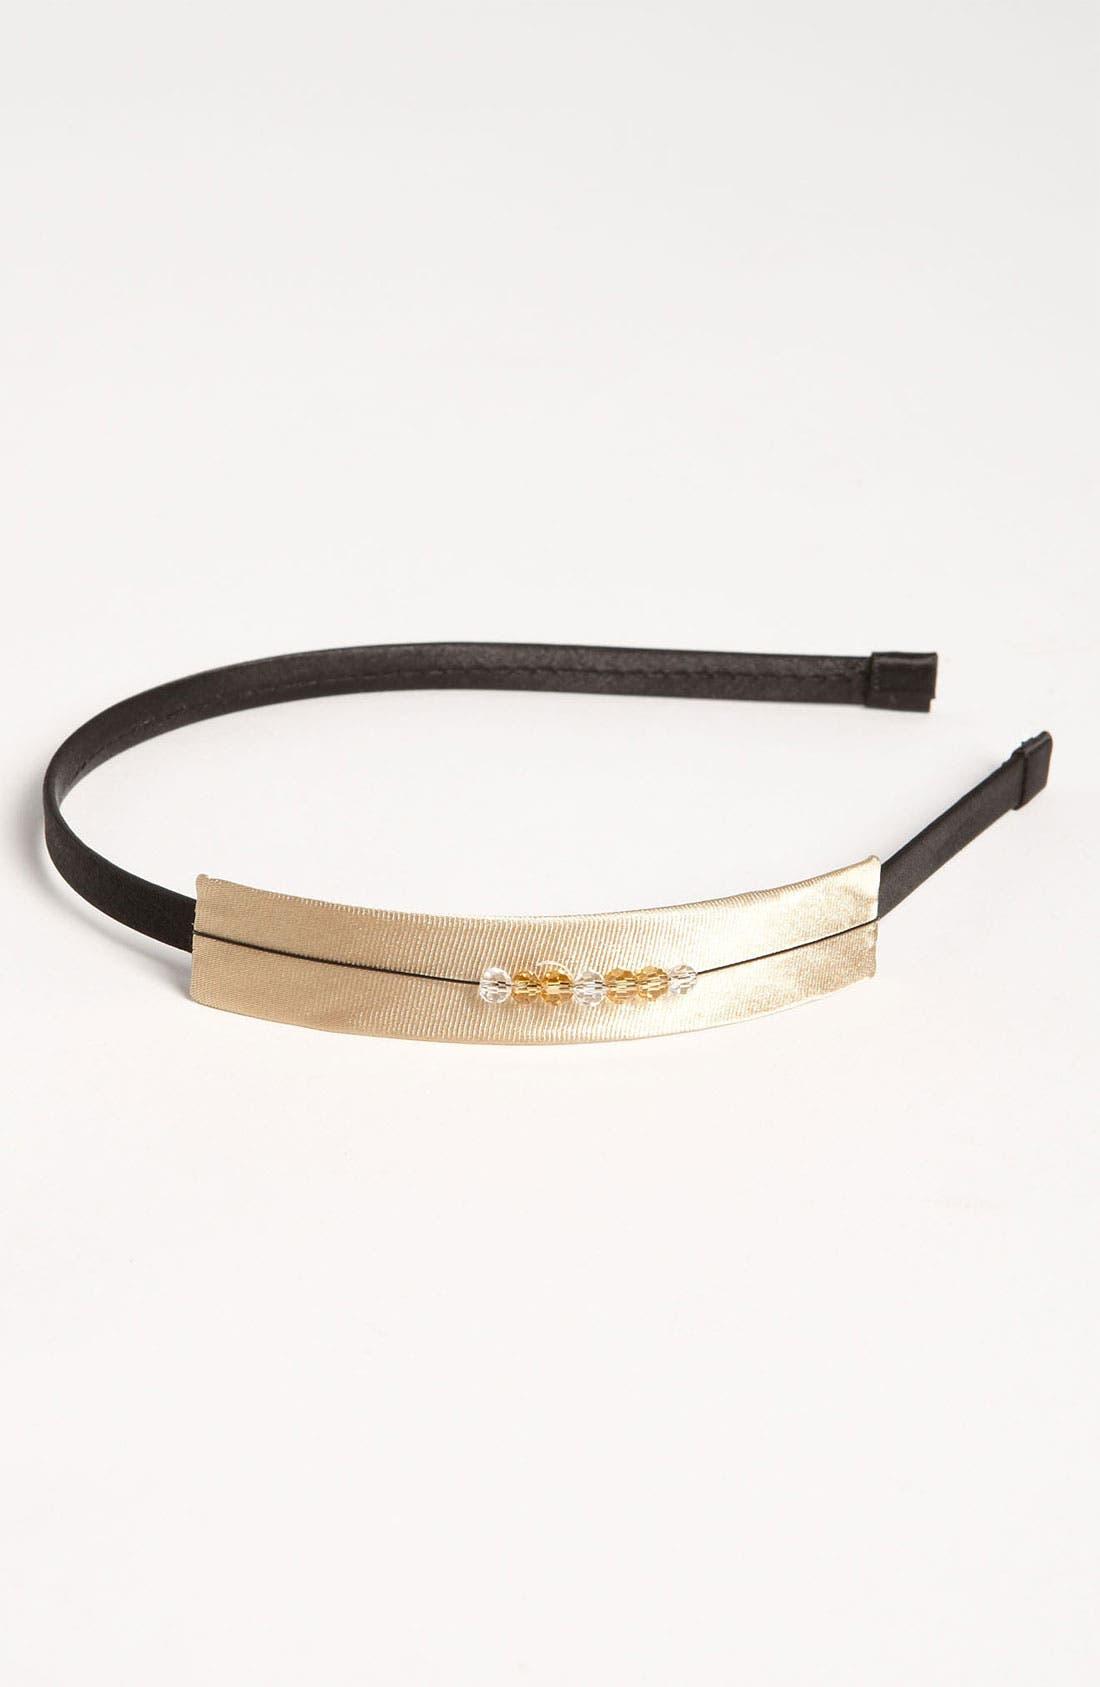 Alternate Image 1 Selected - Tasha 'Color Swatch' Headband